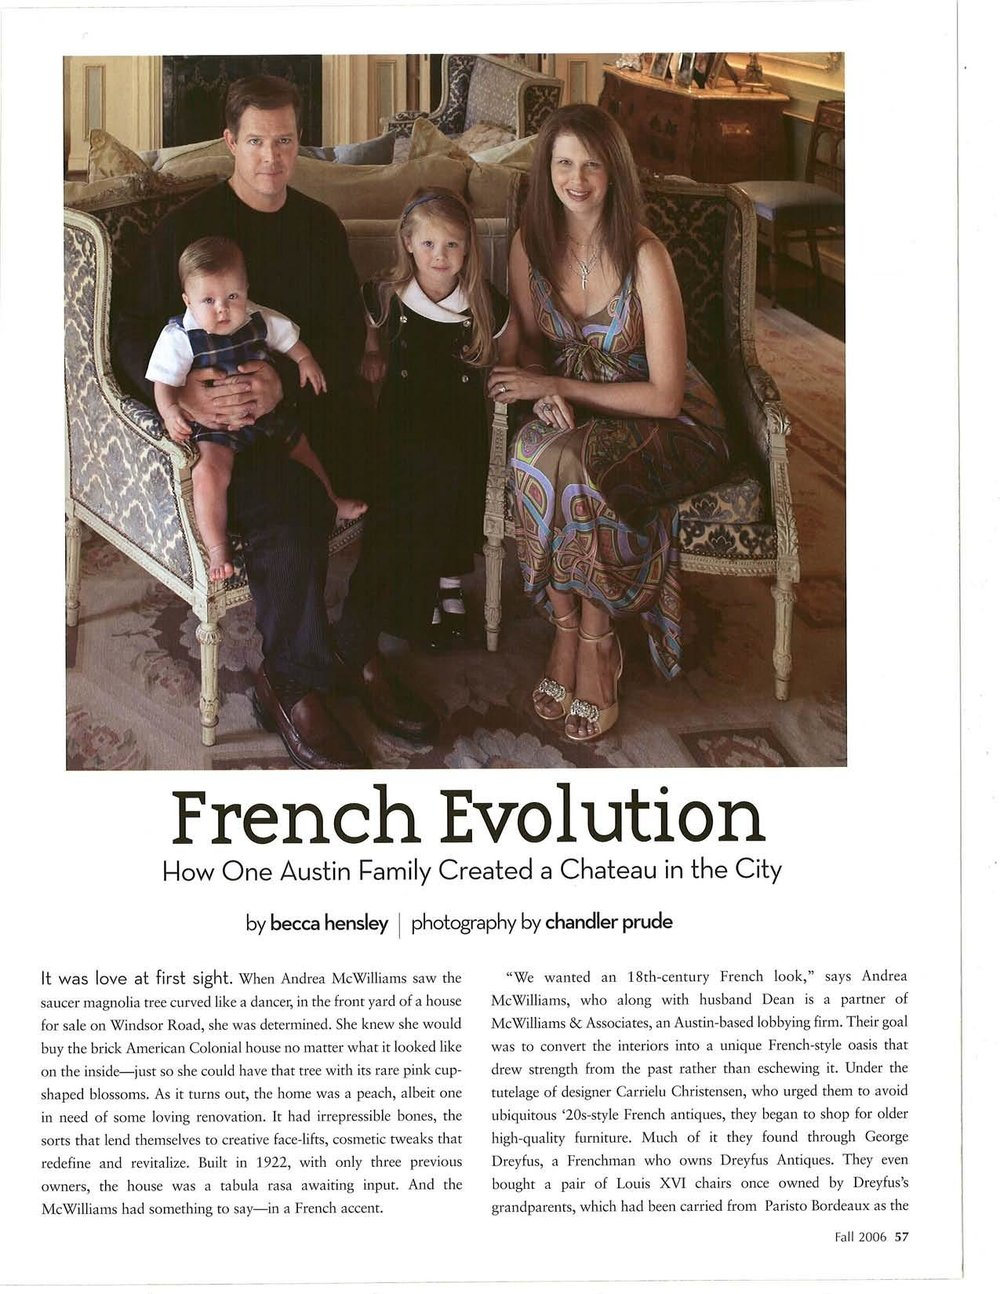 French Evolution